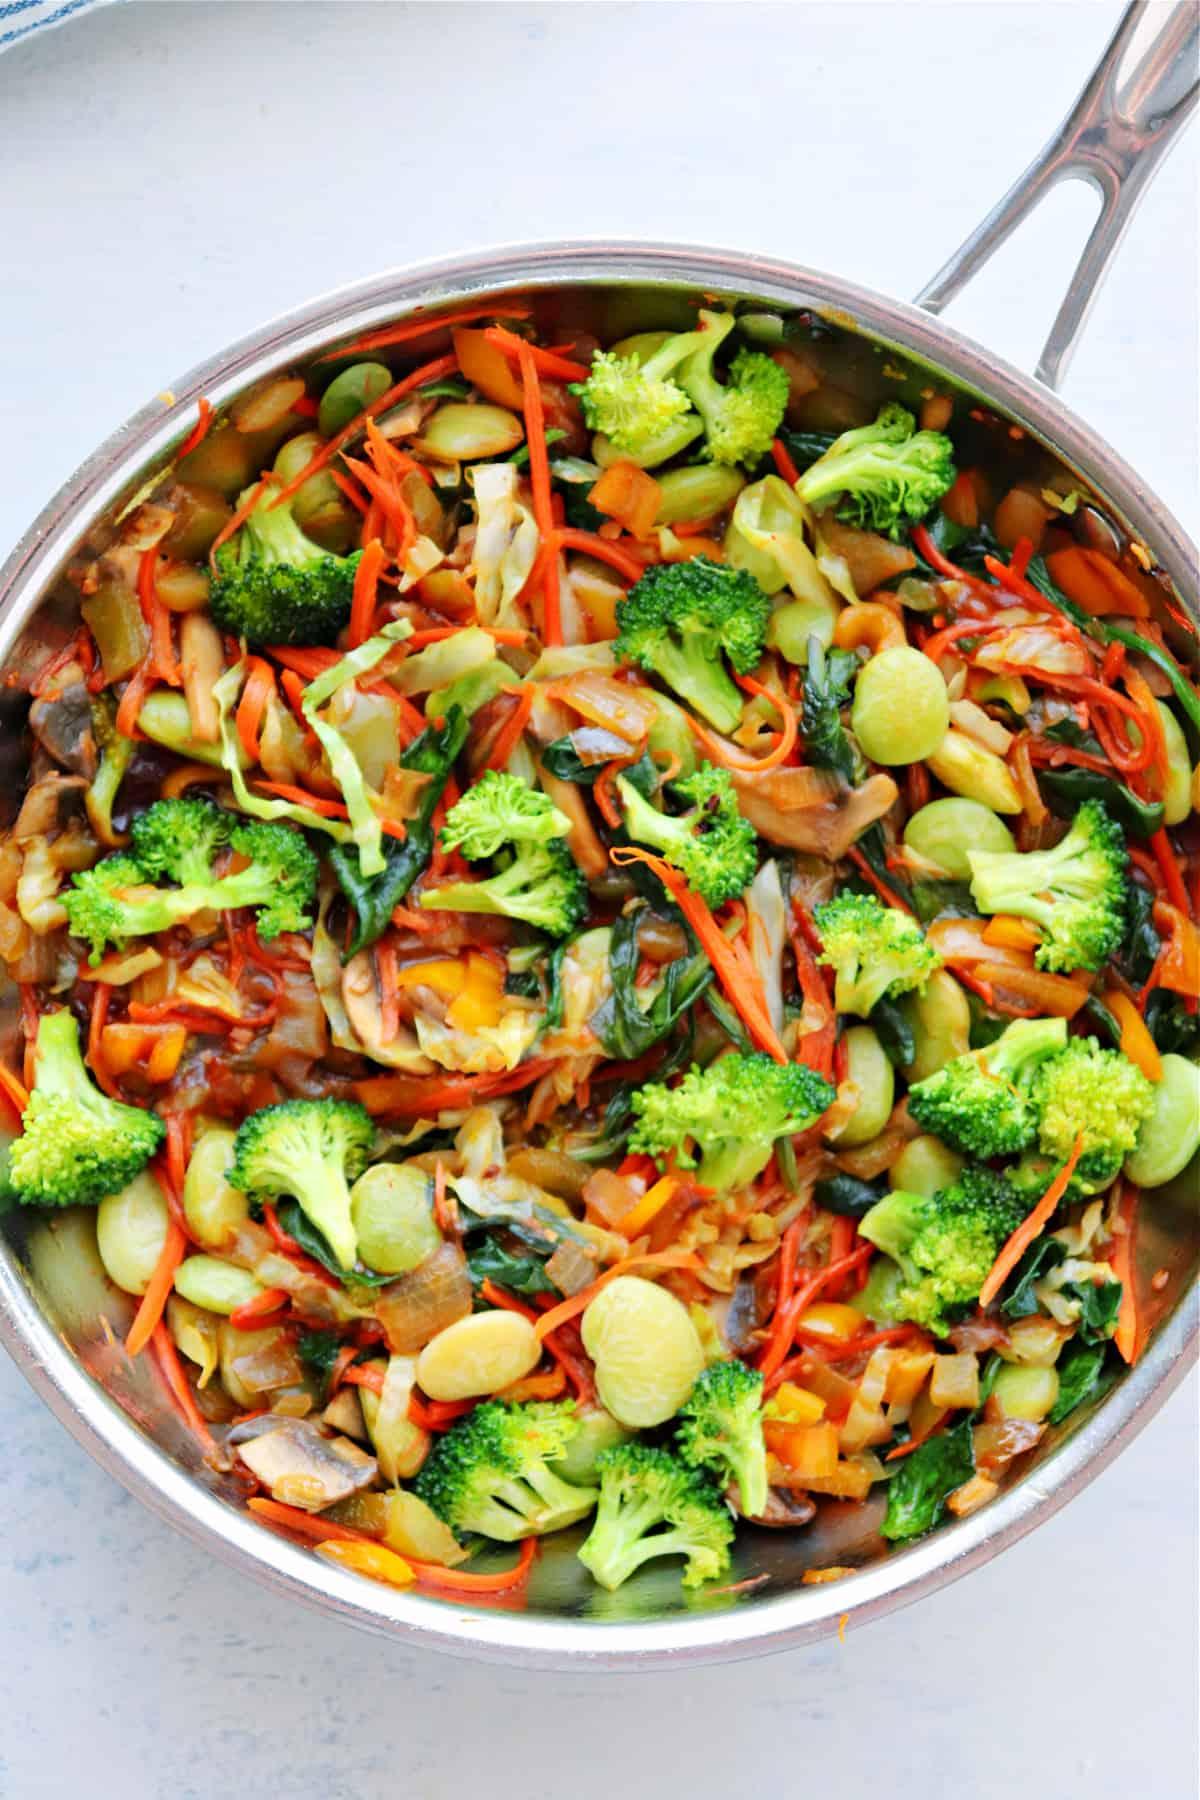 vegetarian stir fry 1 Vegetable Stir Fry